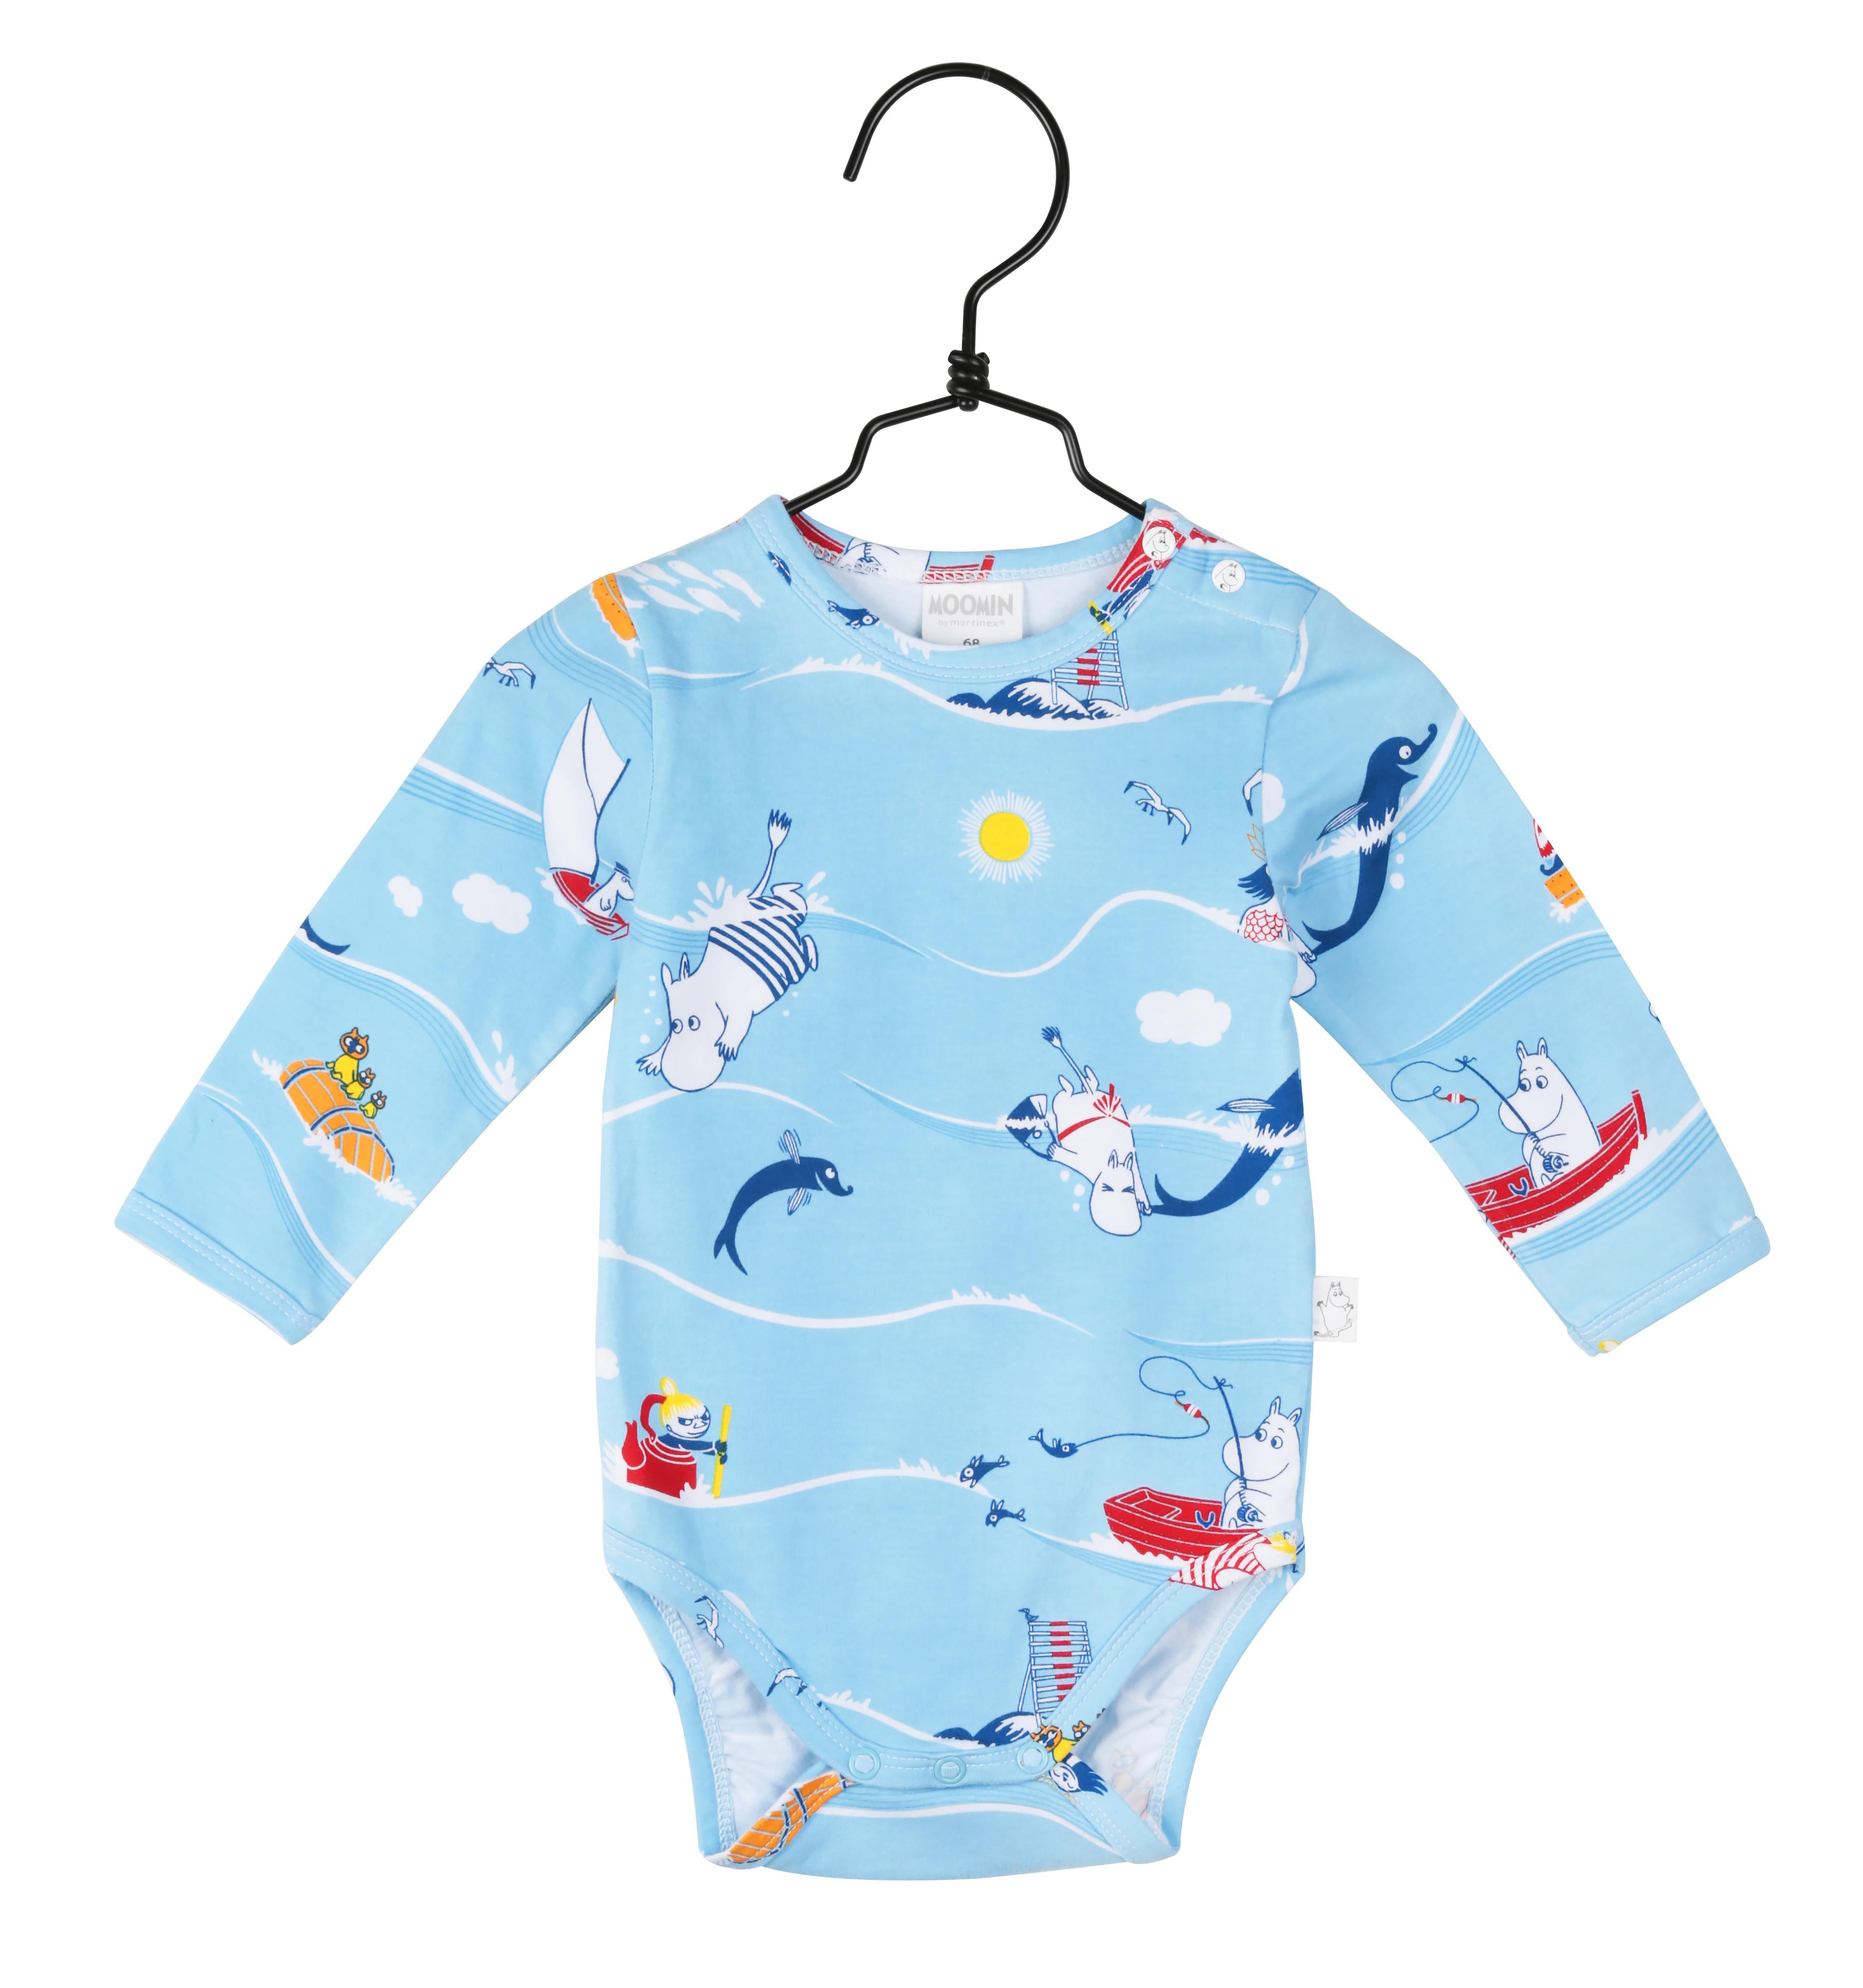 Martinex Moomin Splash Body